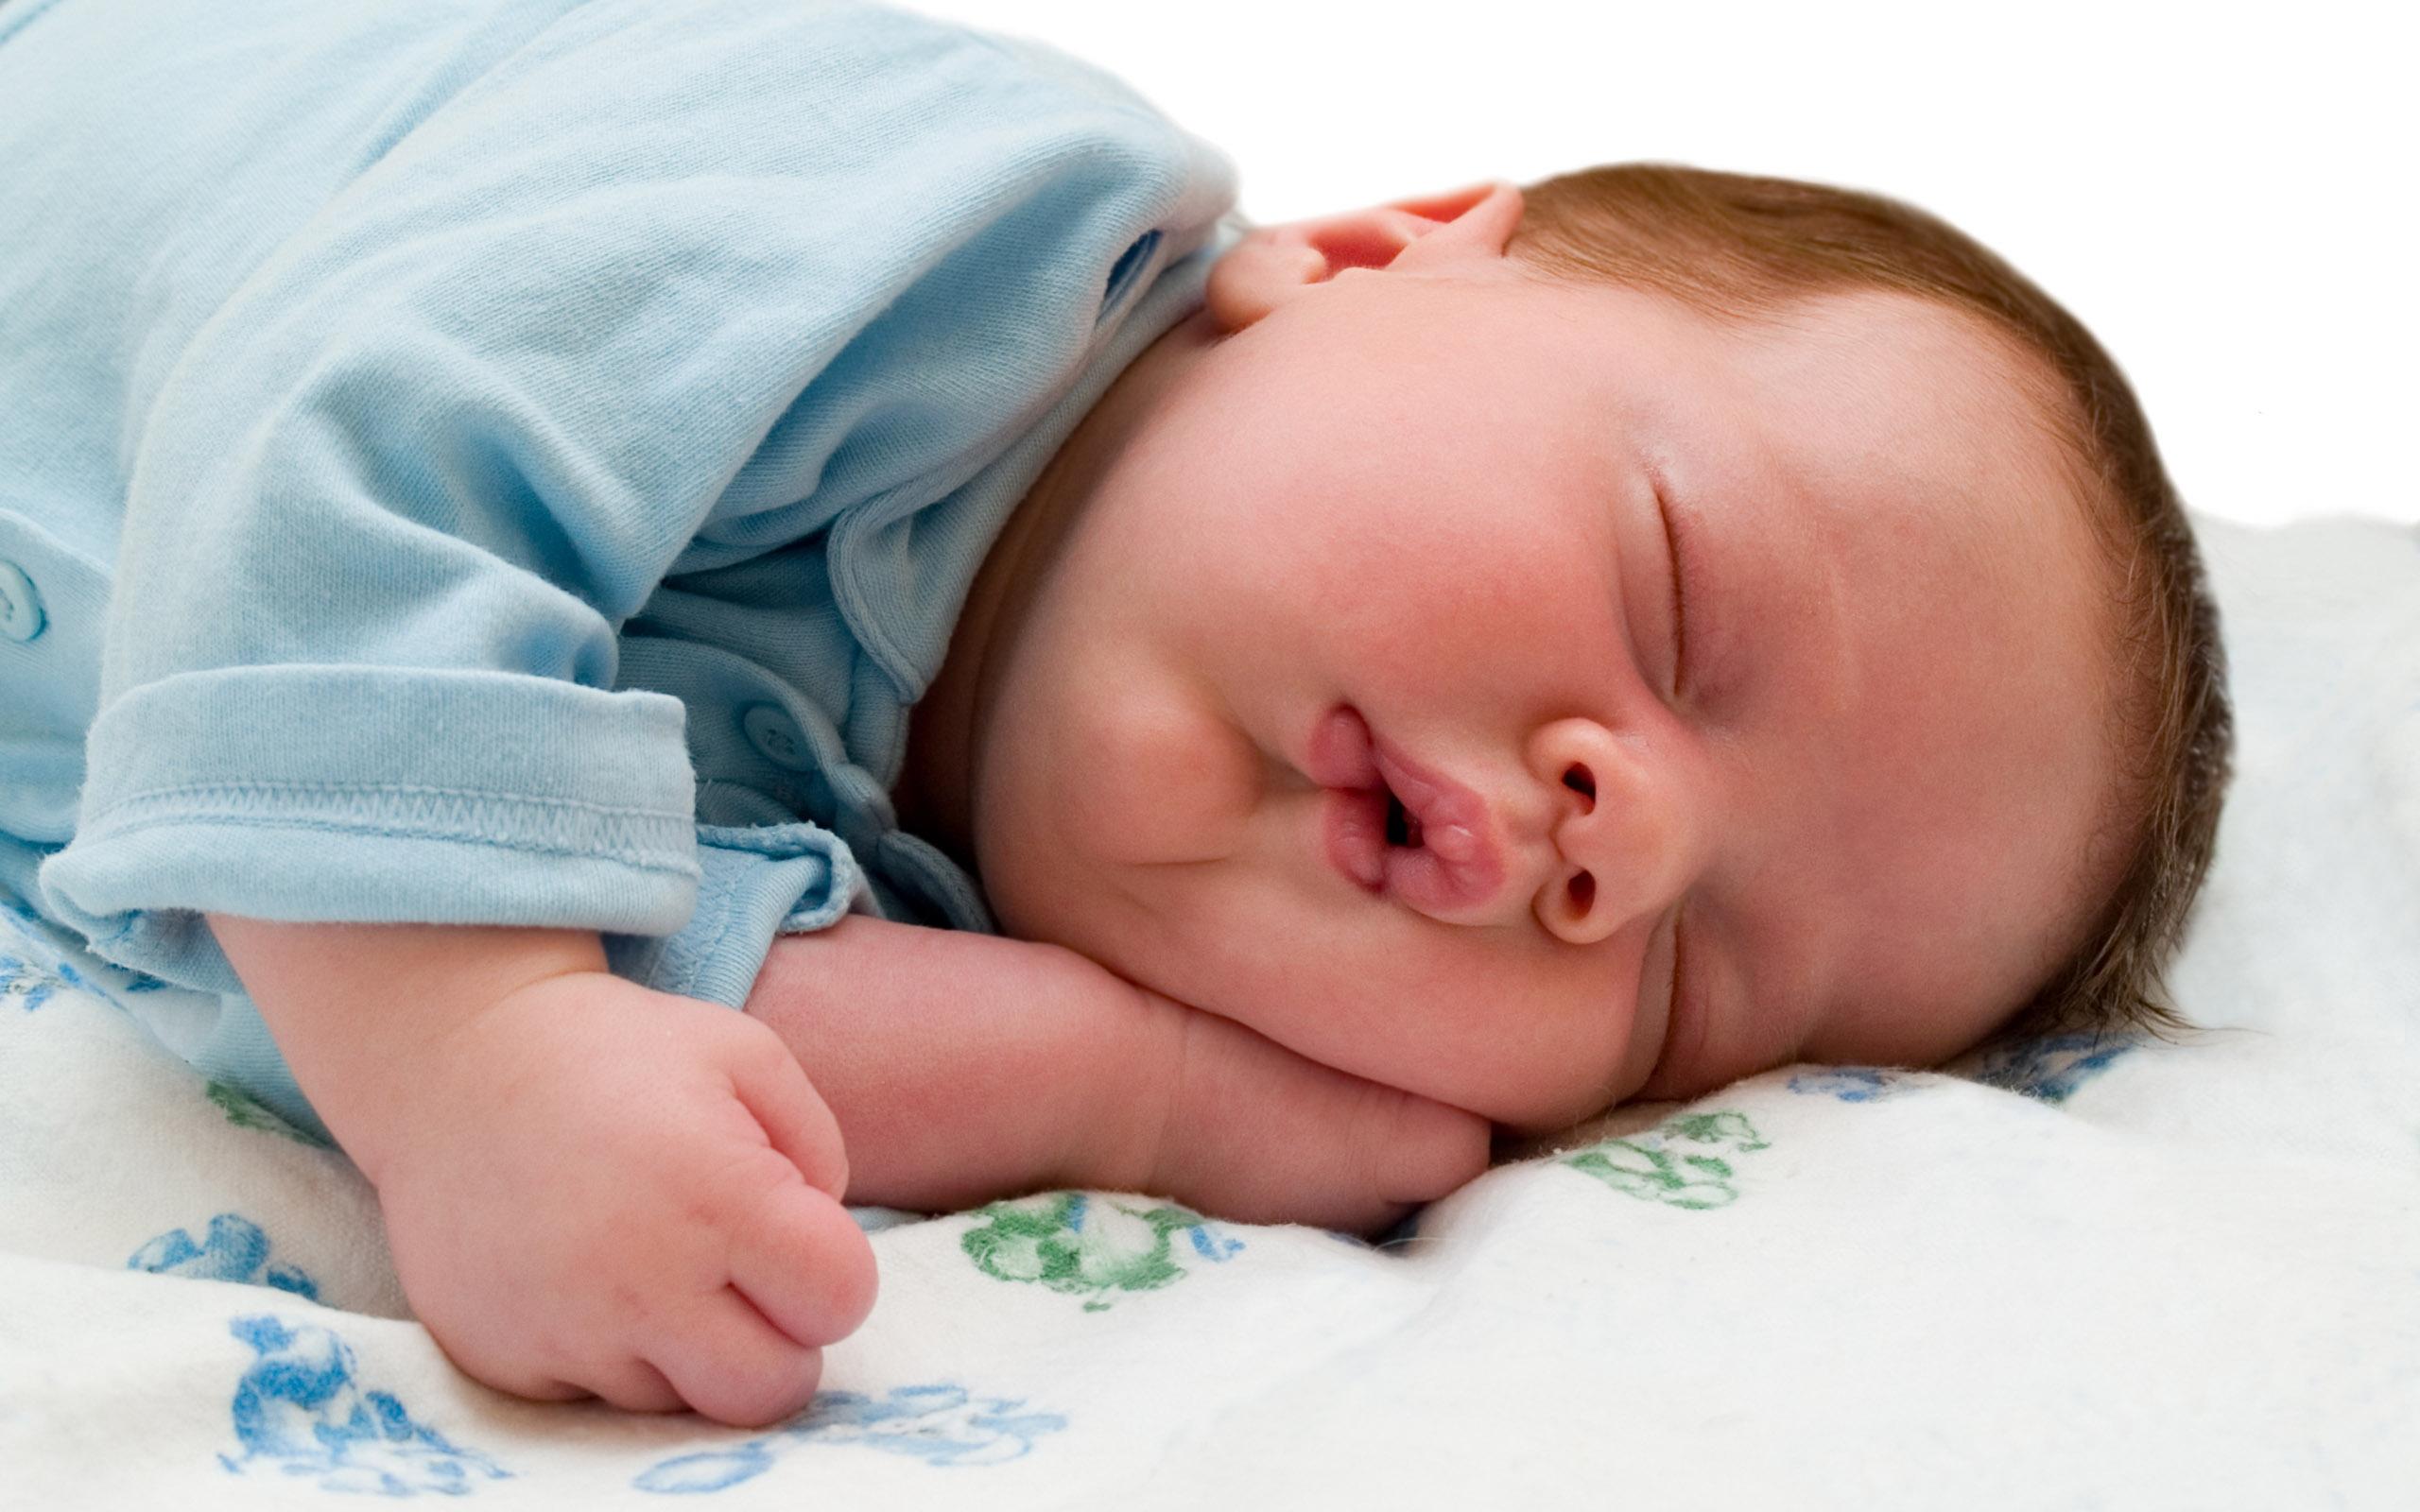 cute baby wallpapers cute baby wallpapers for Desktop Desktop 2560x1600